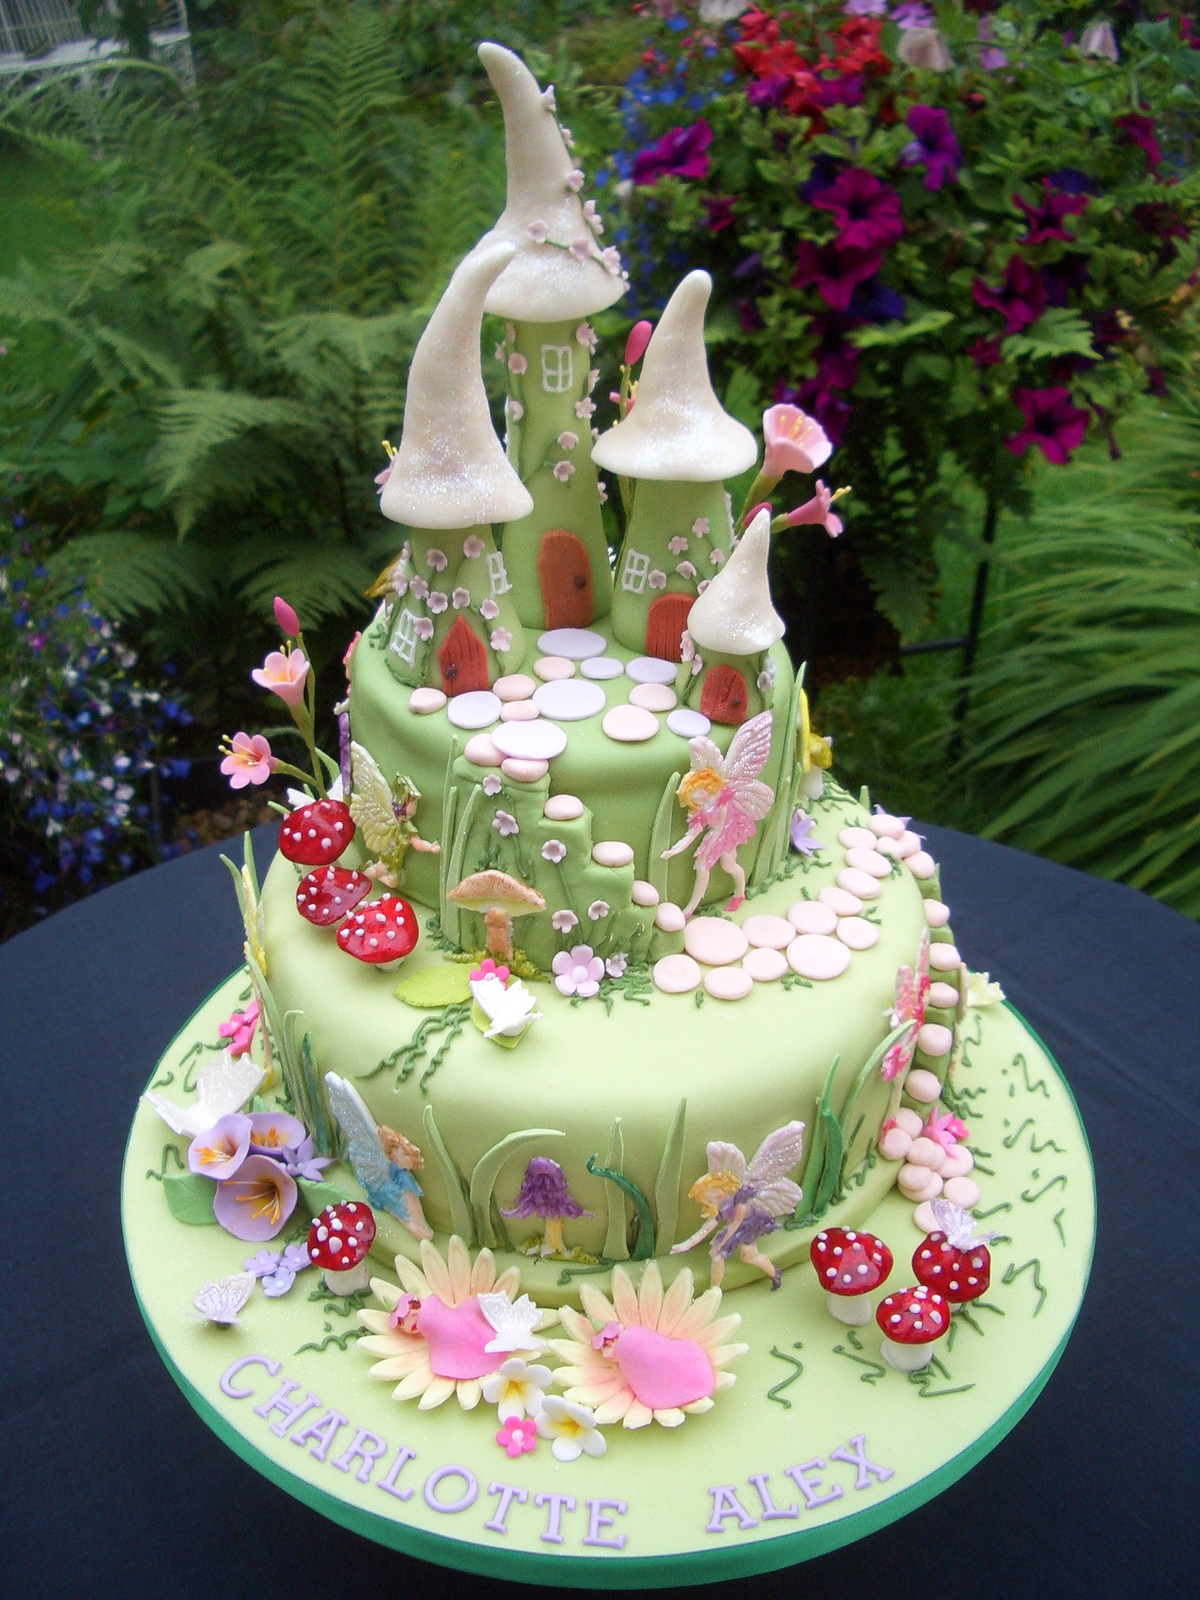 The Twins Birthday Cake